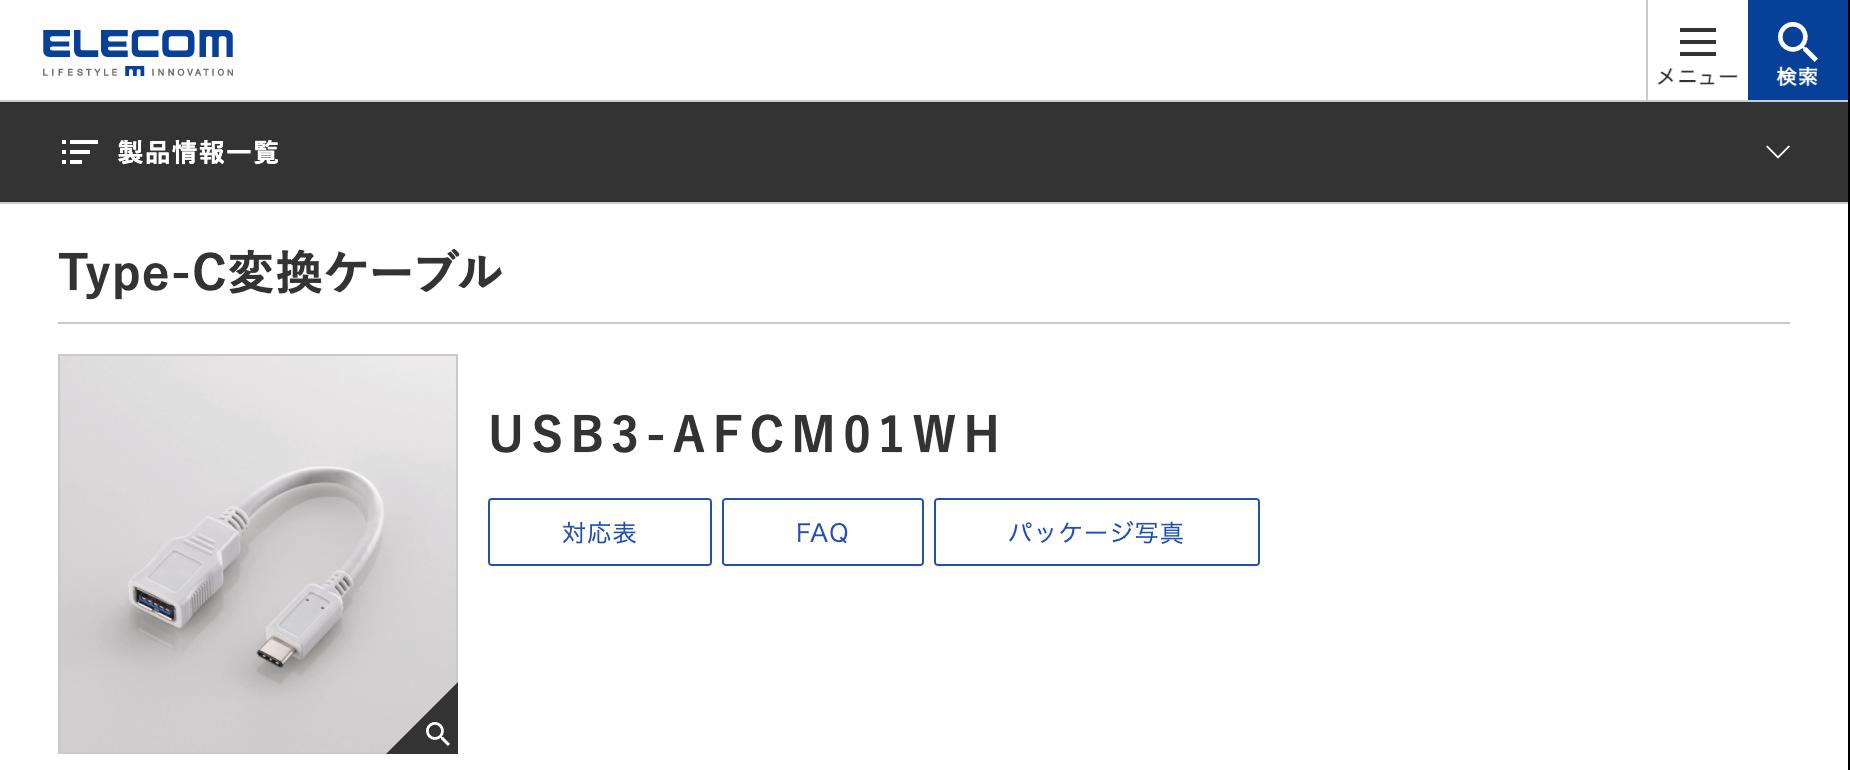 Type-C変換ケーブル USB3-AFCM01WH